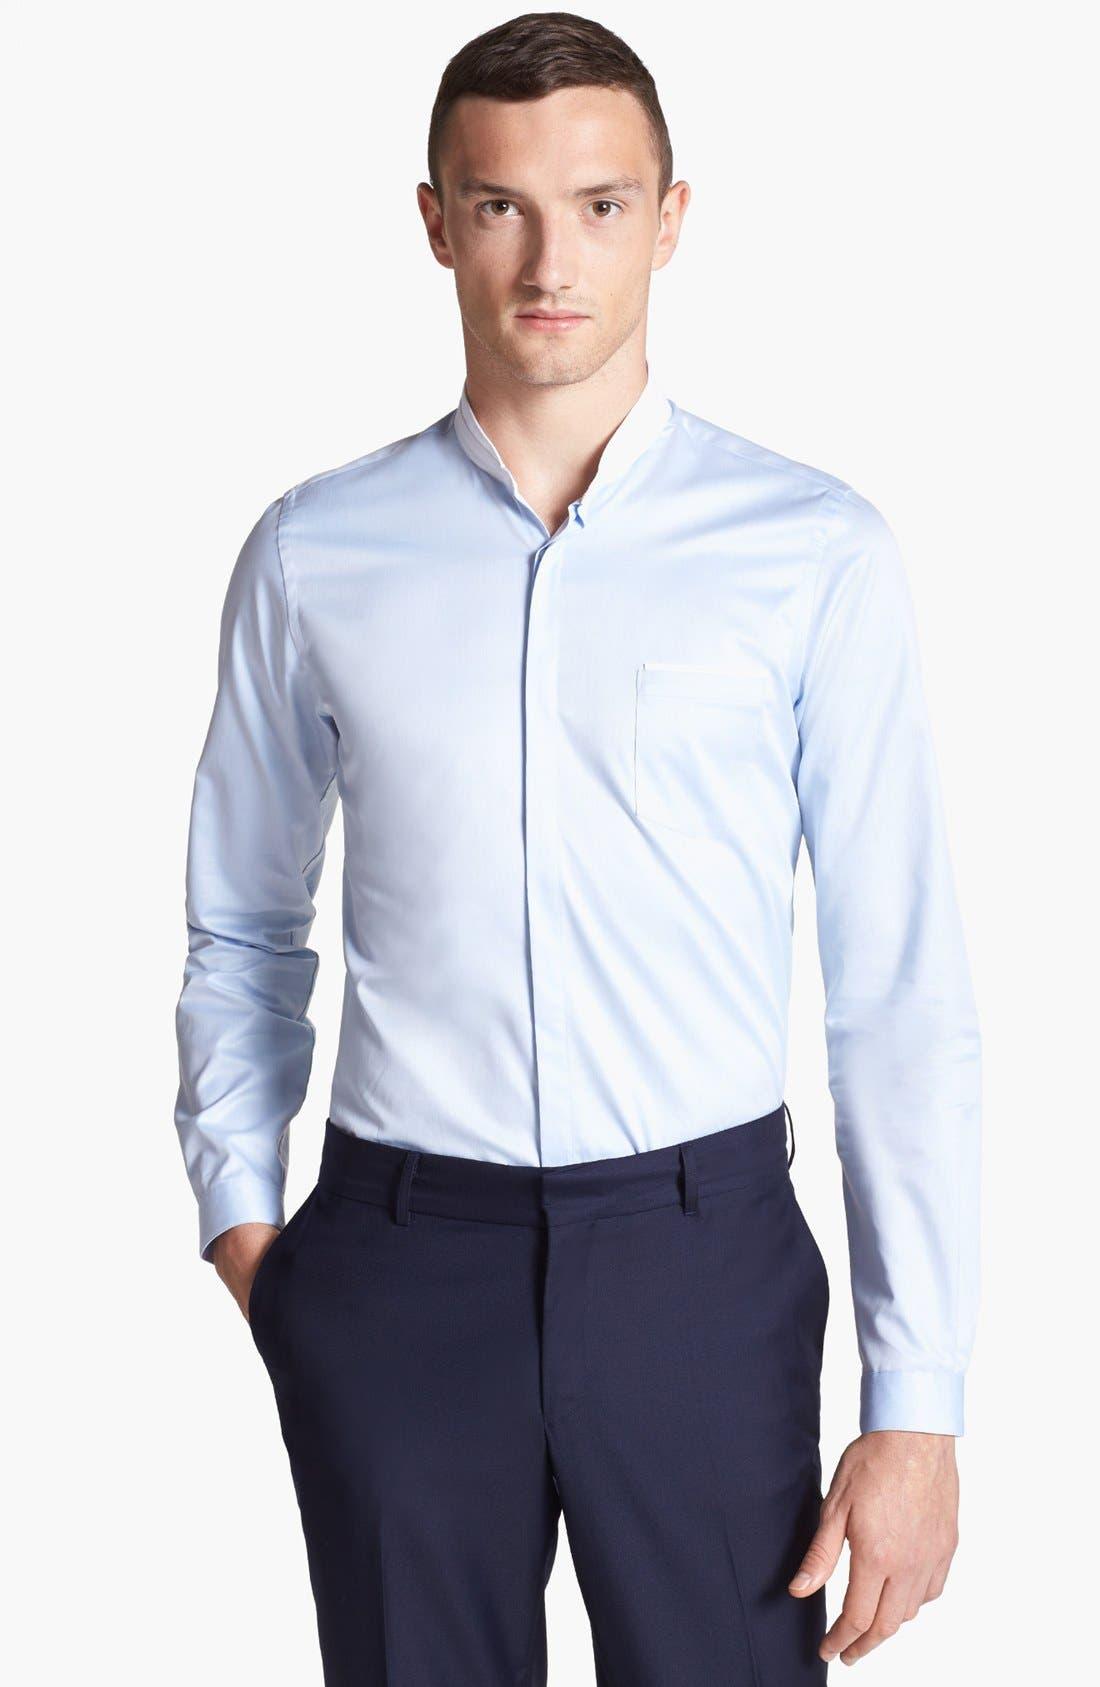 Main Image - The Kooples Round Collar Dress Shirt